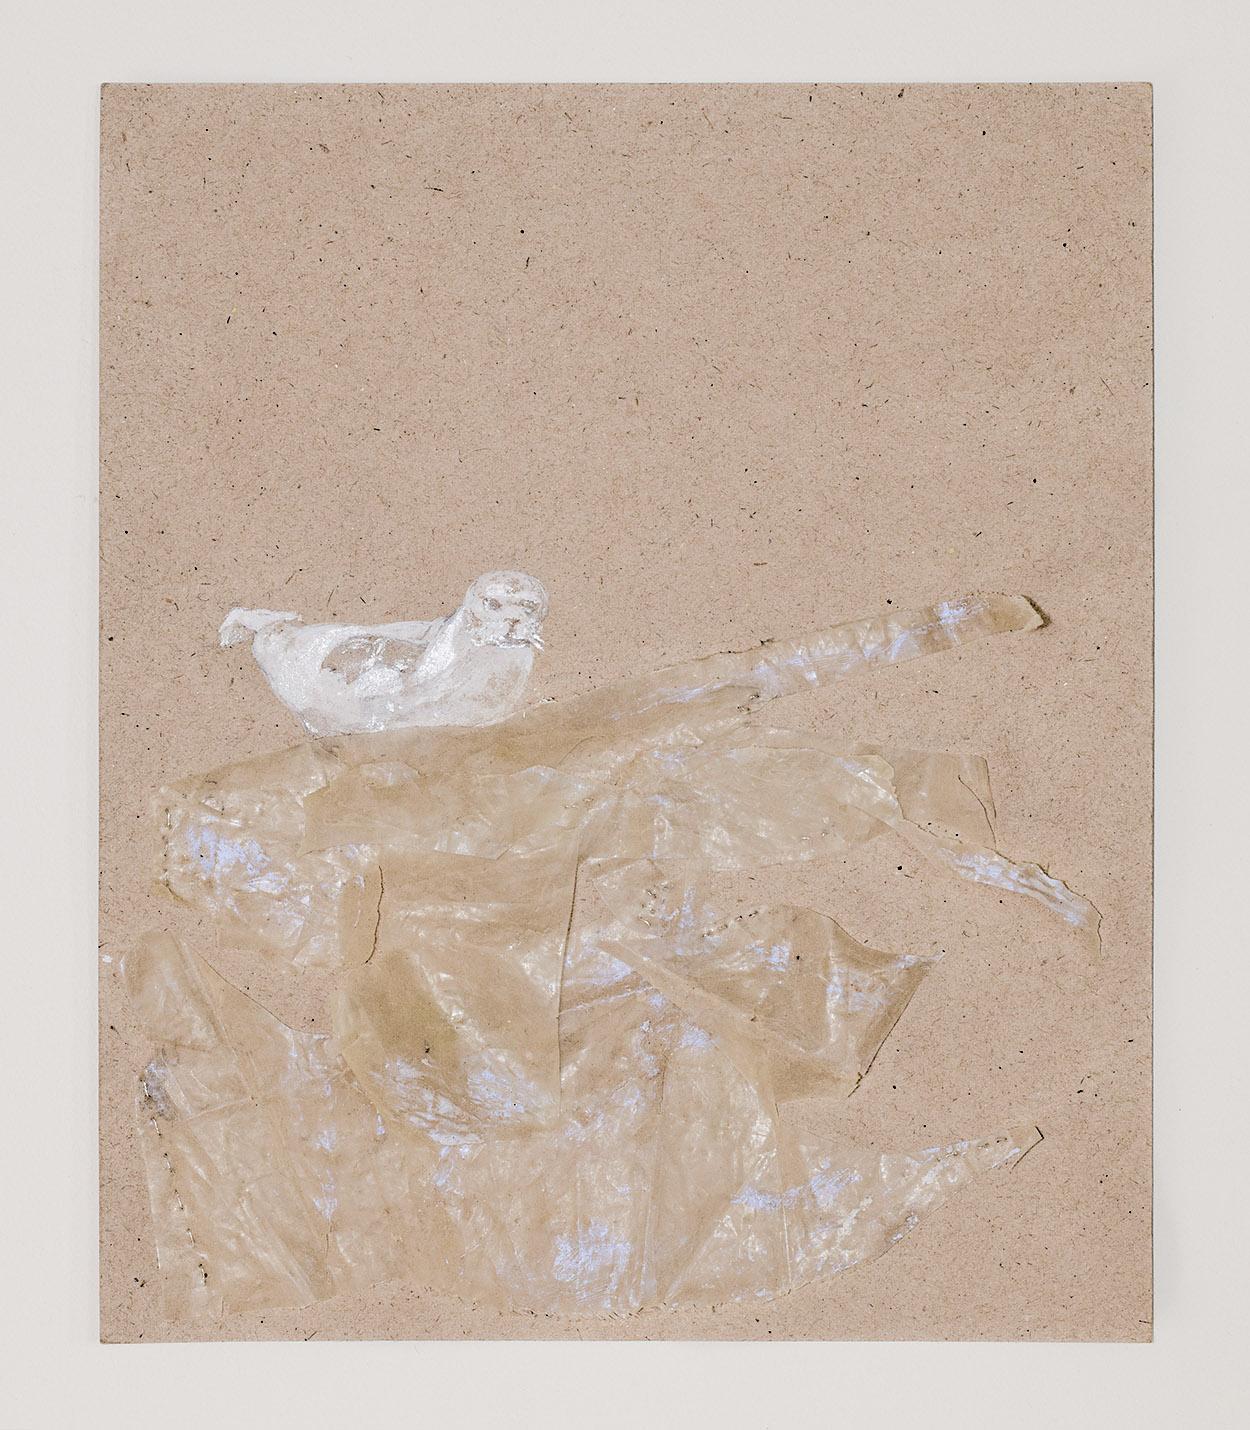 Monachus monachus III    / Foca Monge  Drawing, tempera, varnish, thread and found plastic at the beach. 23,5 x 28 cm.